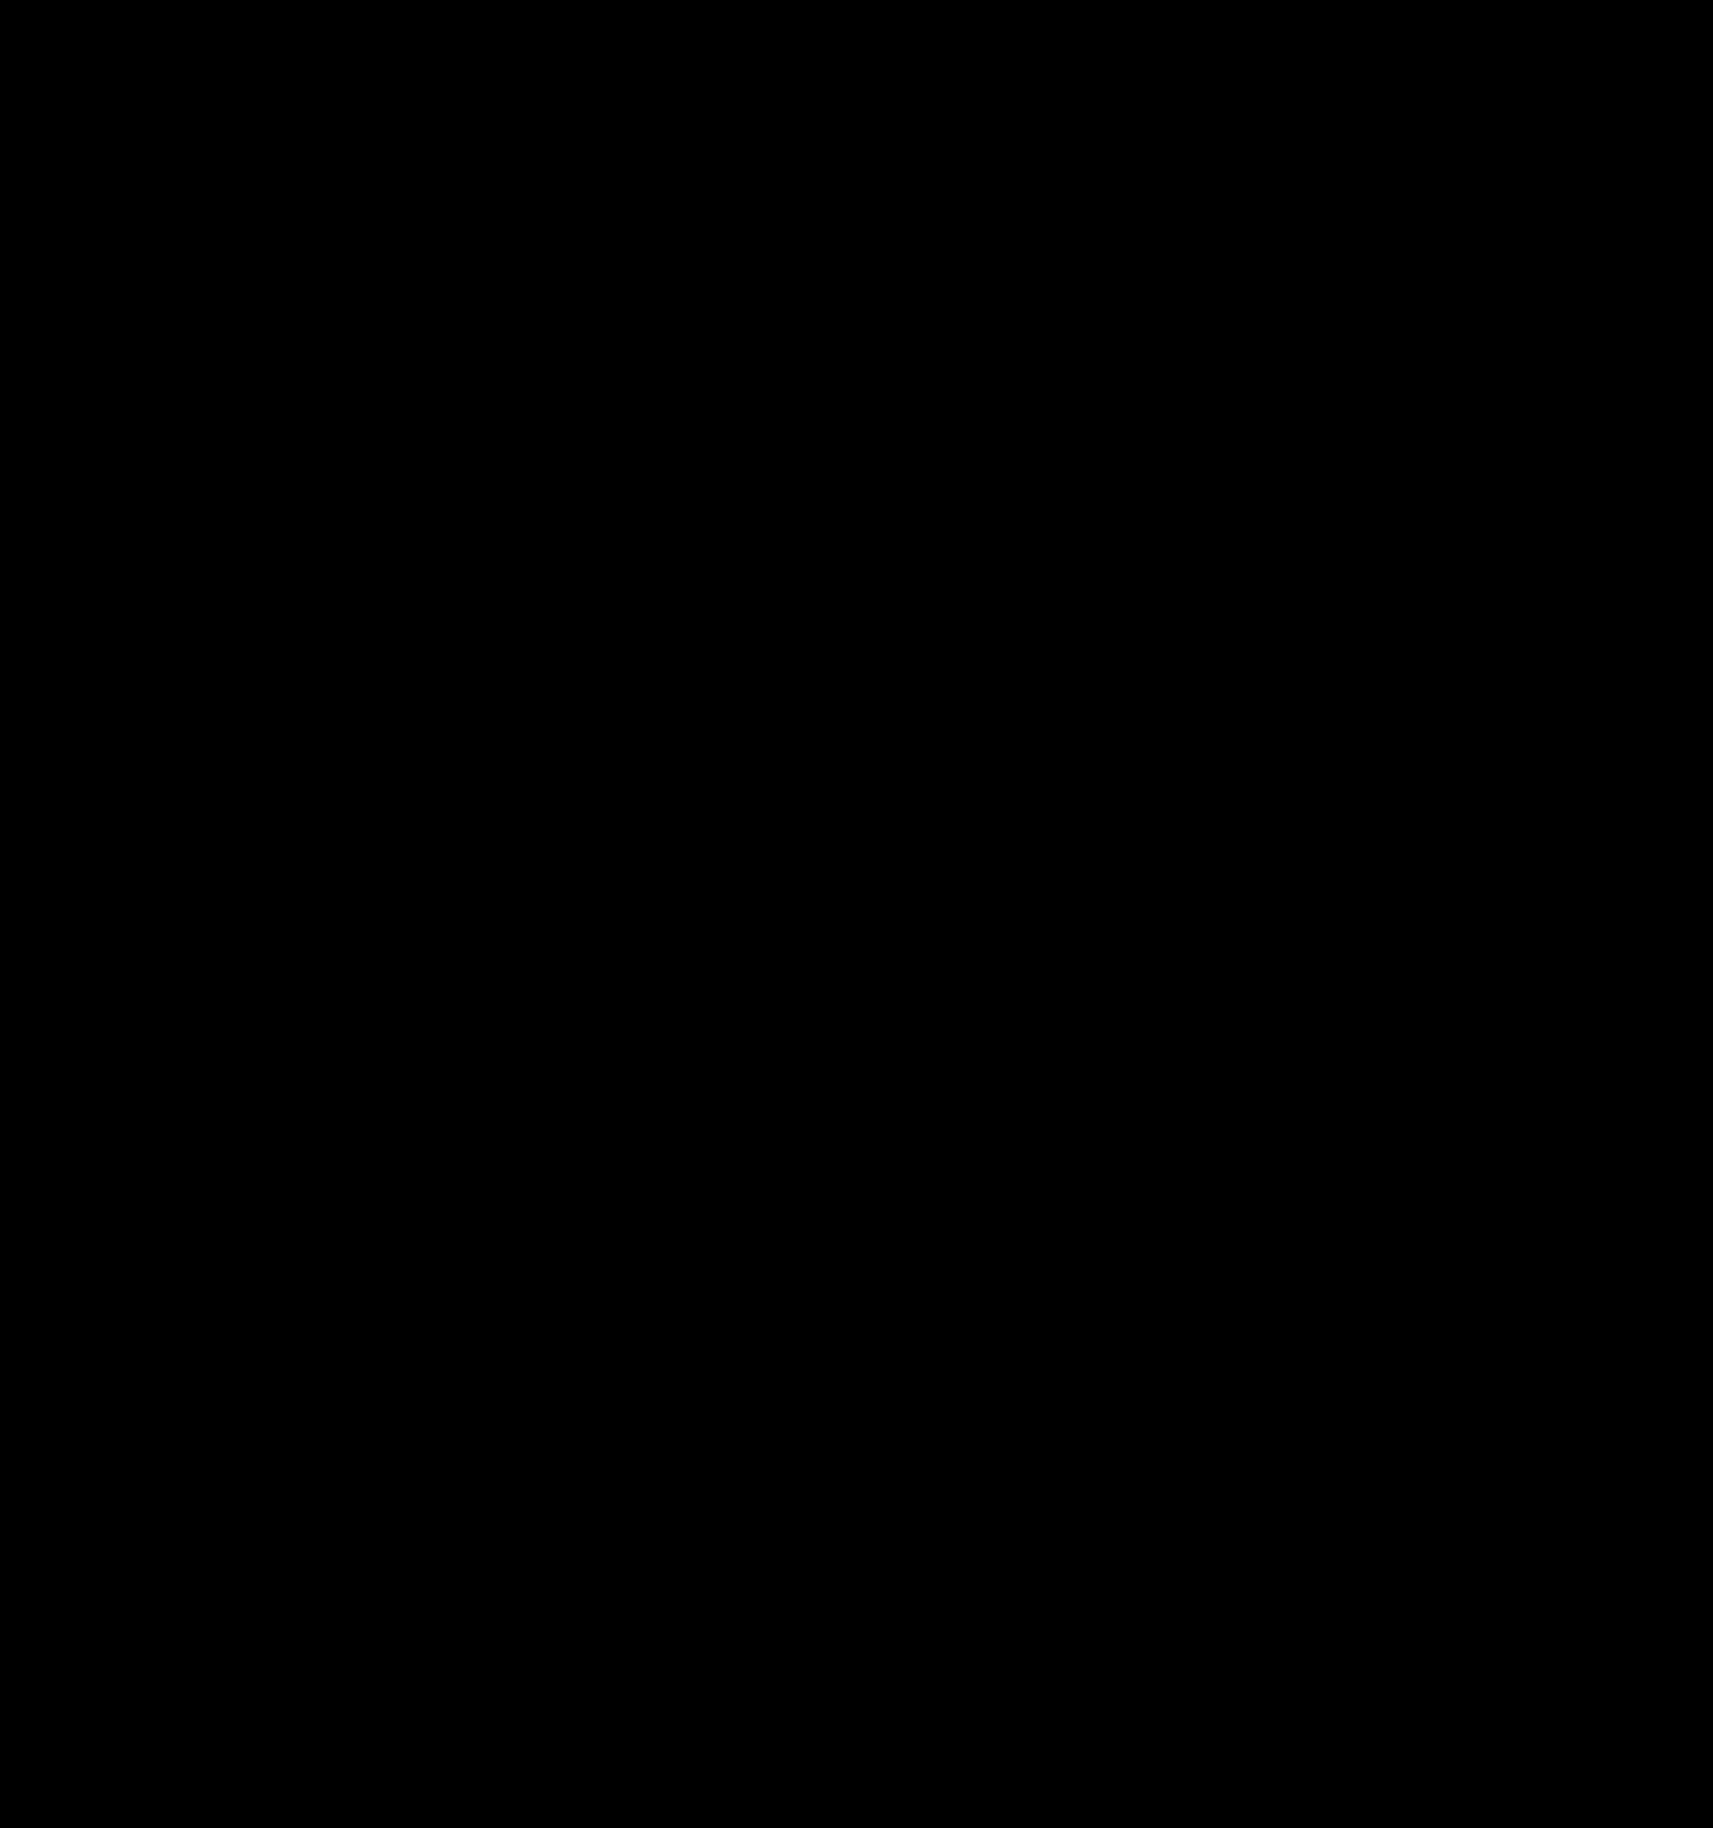 GL Gonio Spectrometer